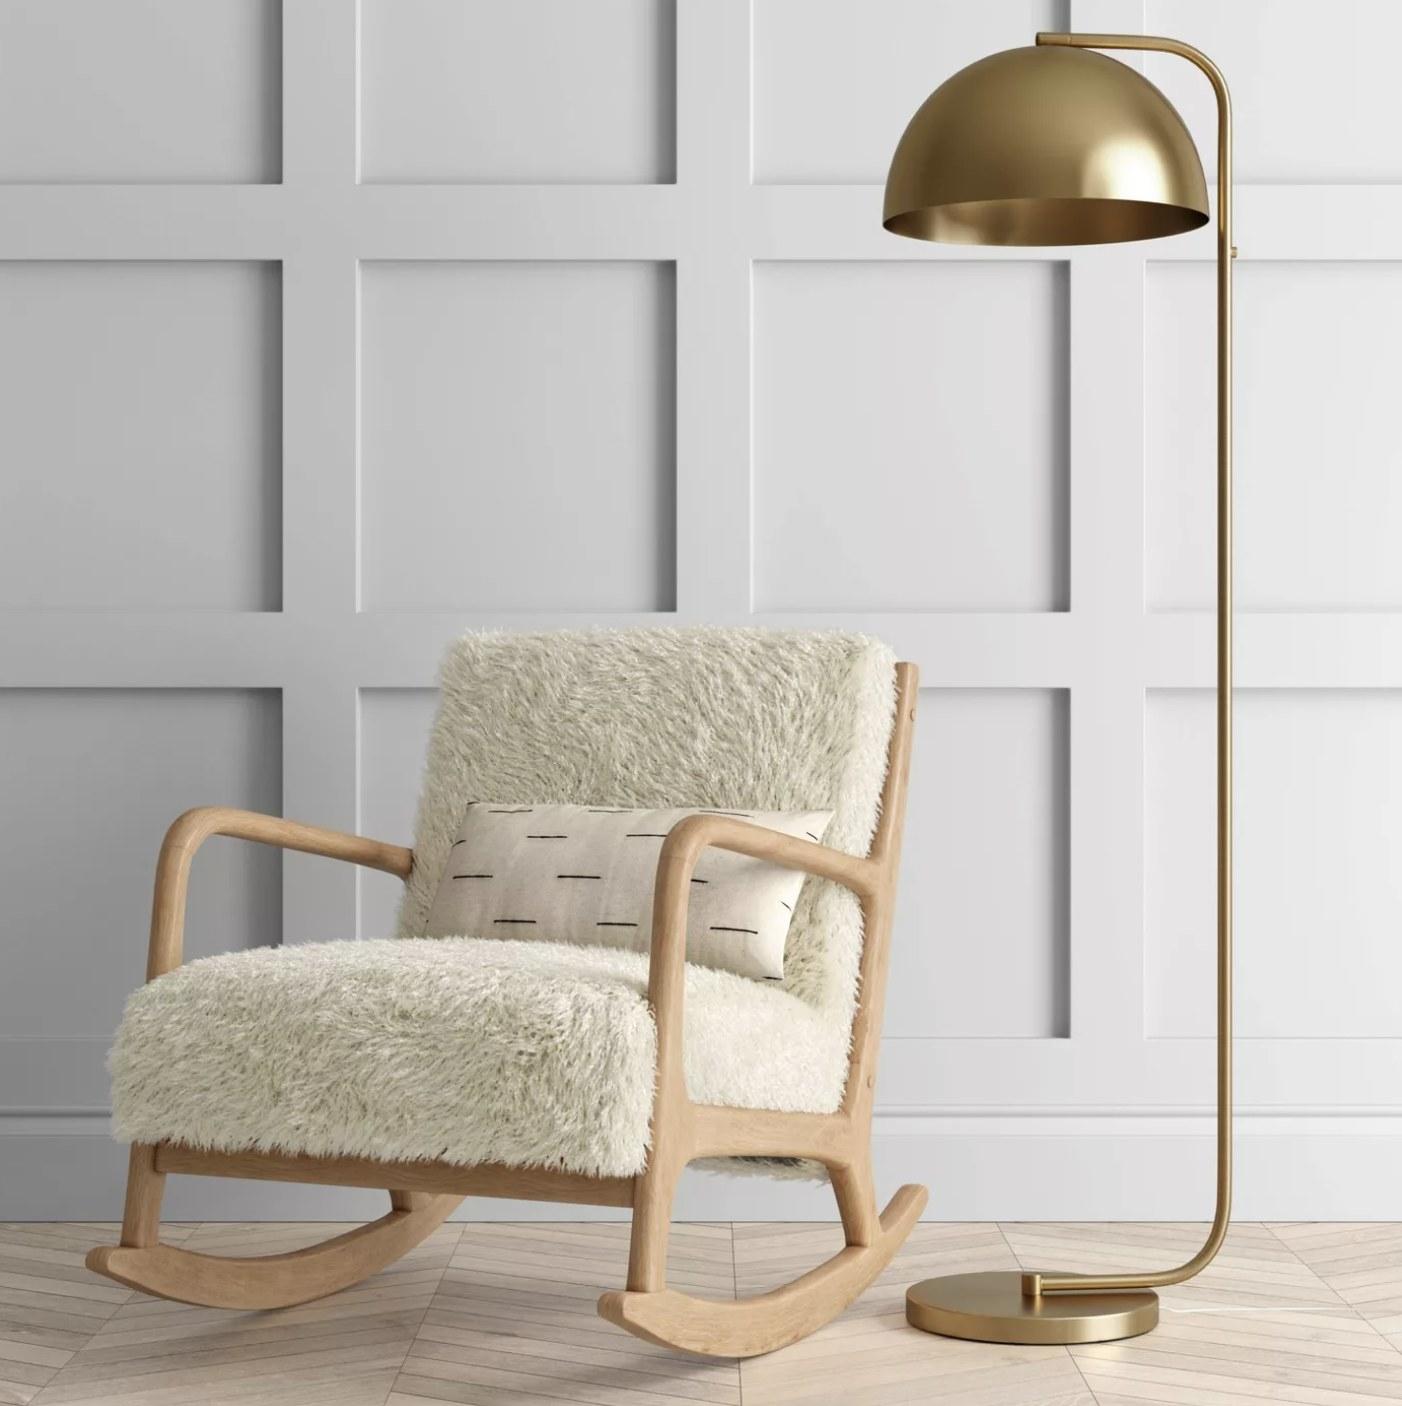 A brass floor lamp next to a chair